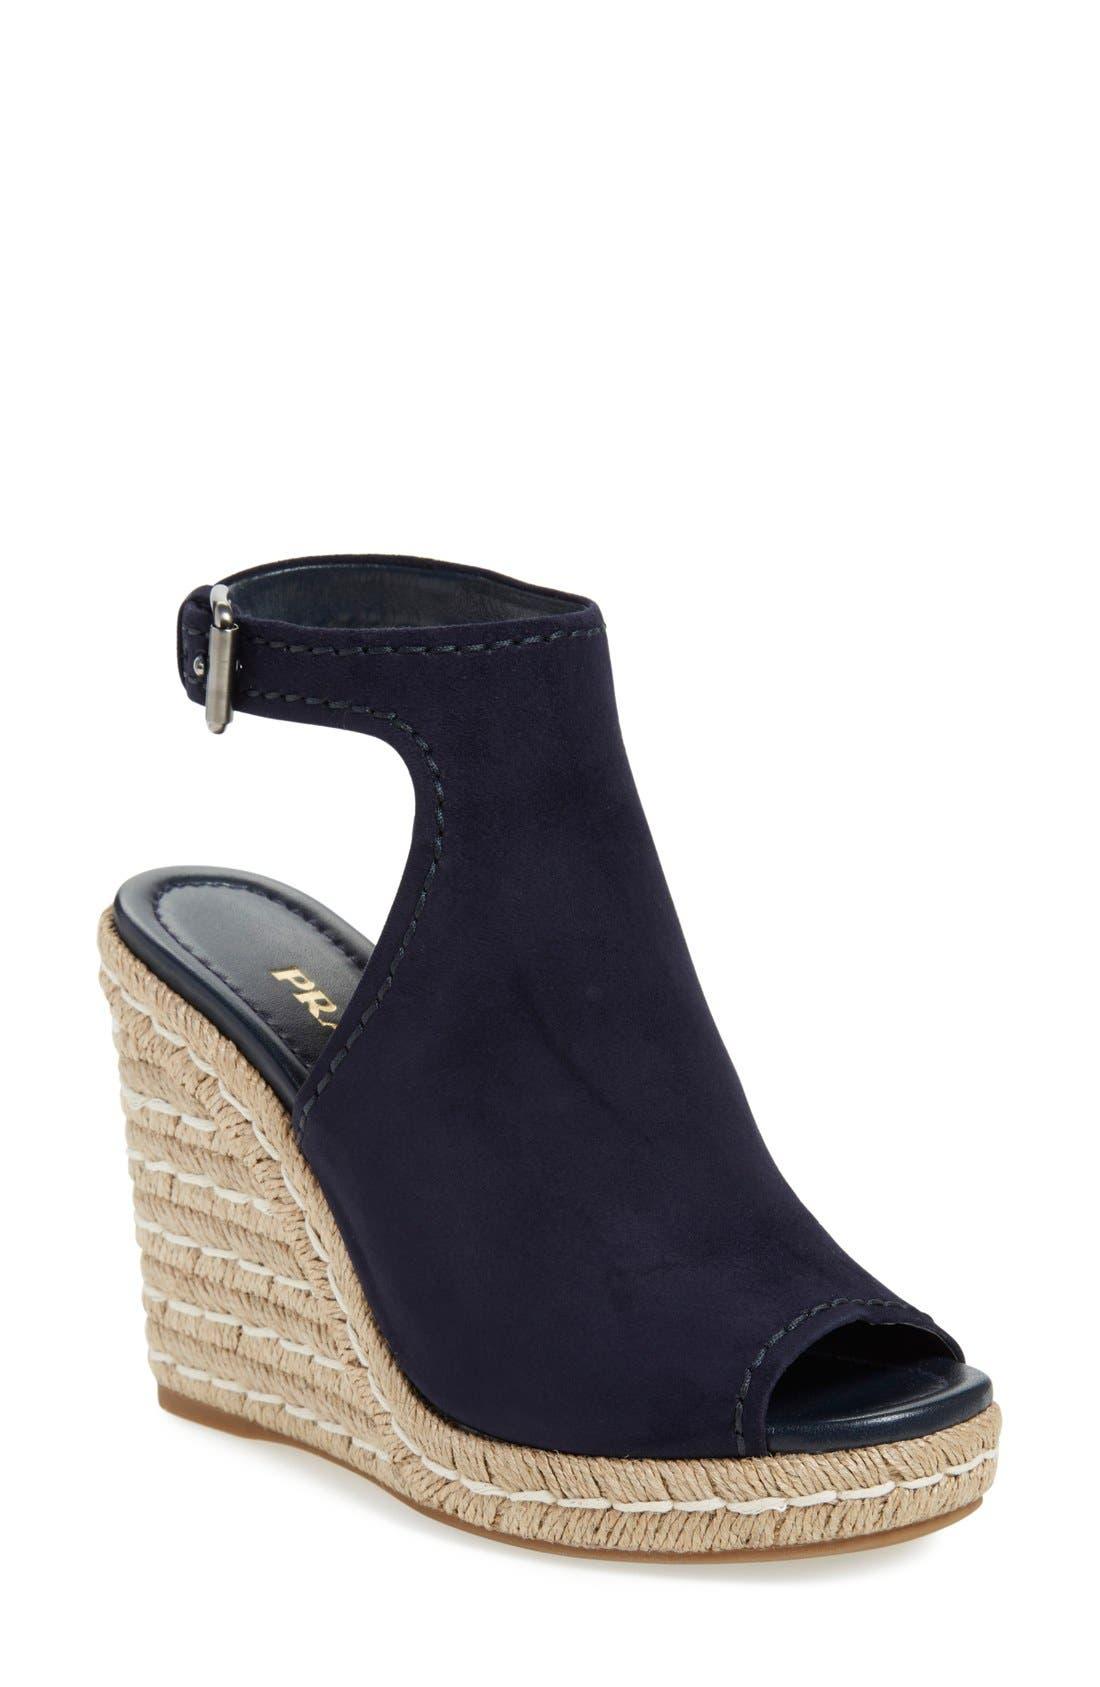 Prada Ankle Strap Espadrille Wedge Sandal (Women)